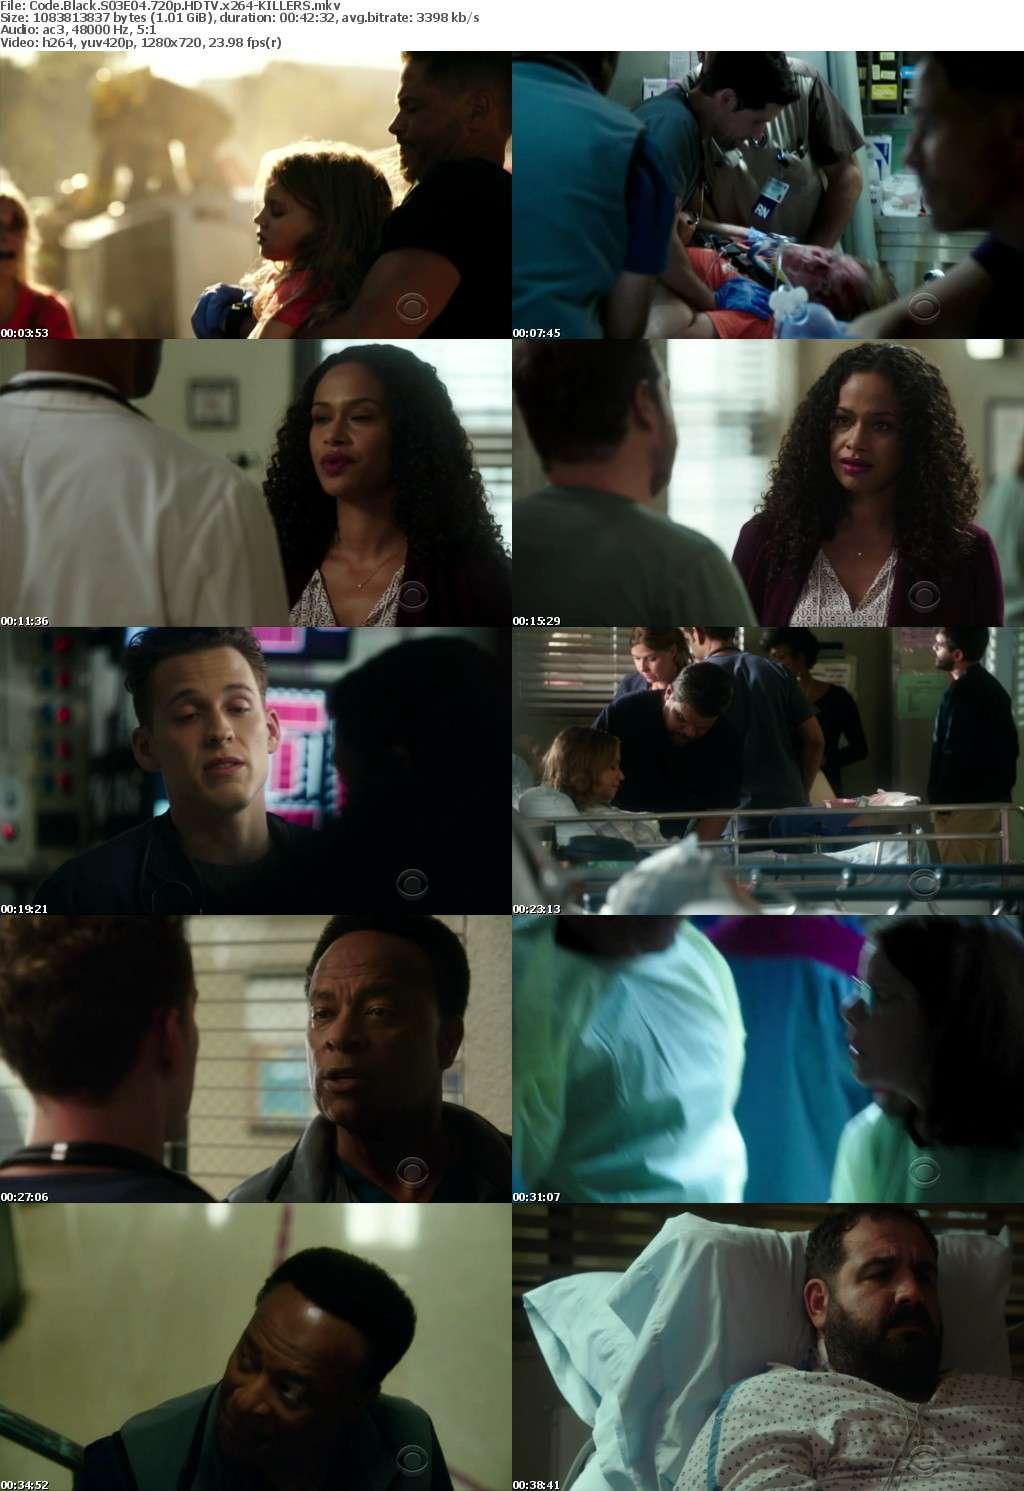 Code Black S03E04 720p HDTV x264-KILLERS